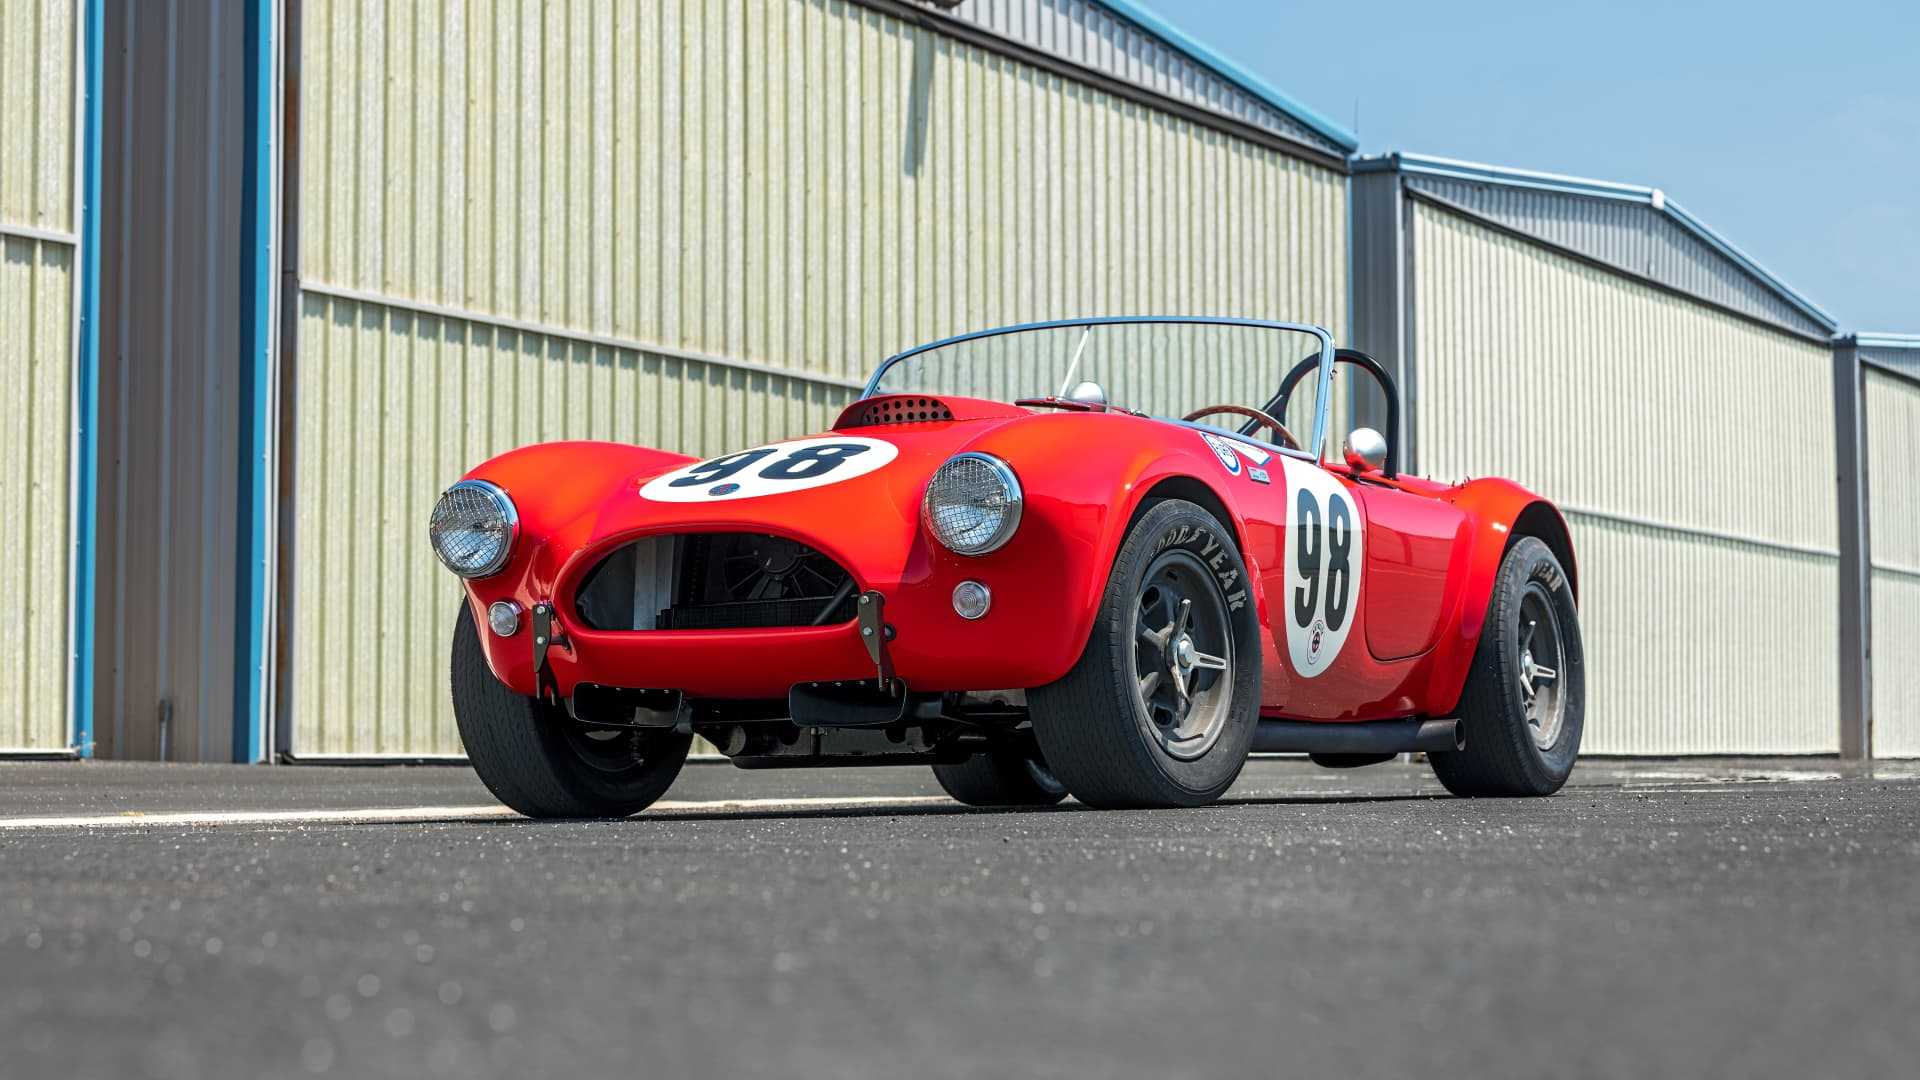 1963 Shelby Cobra 289 Works